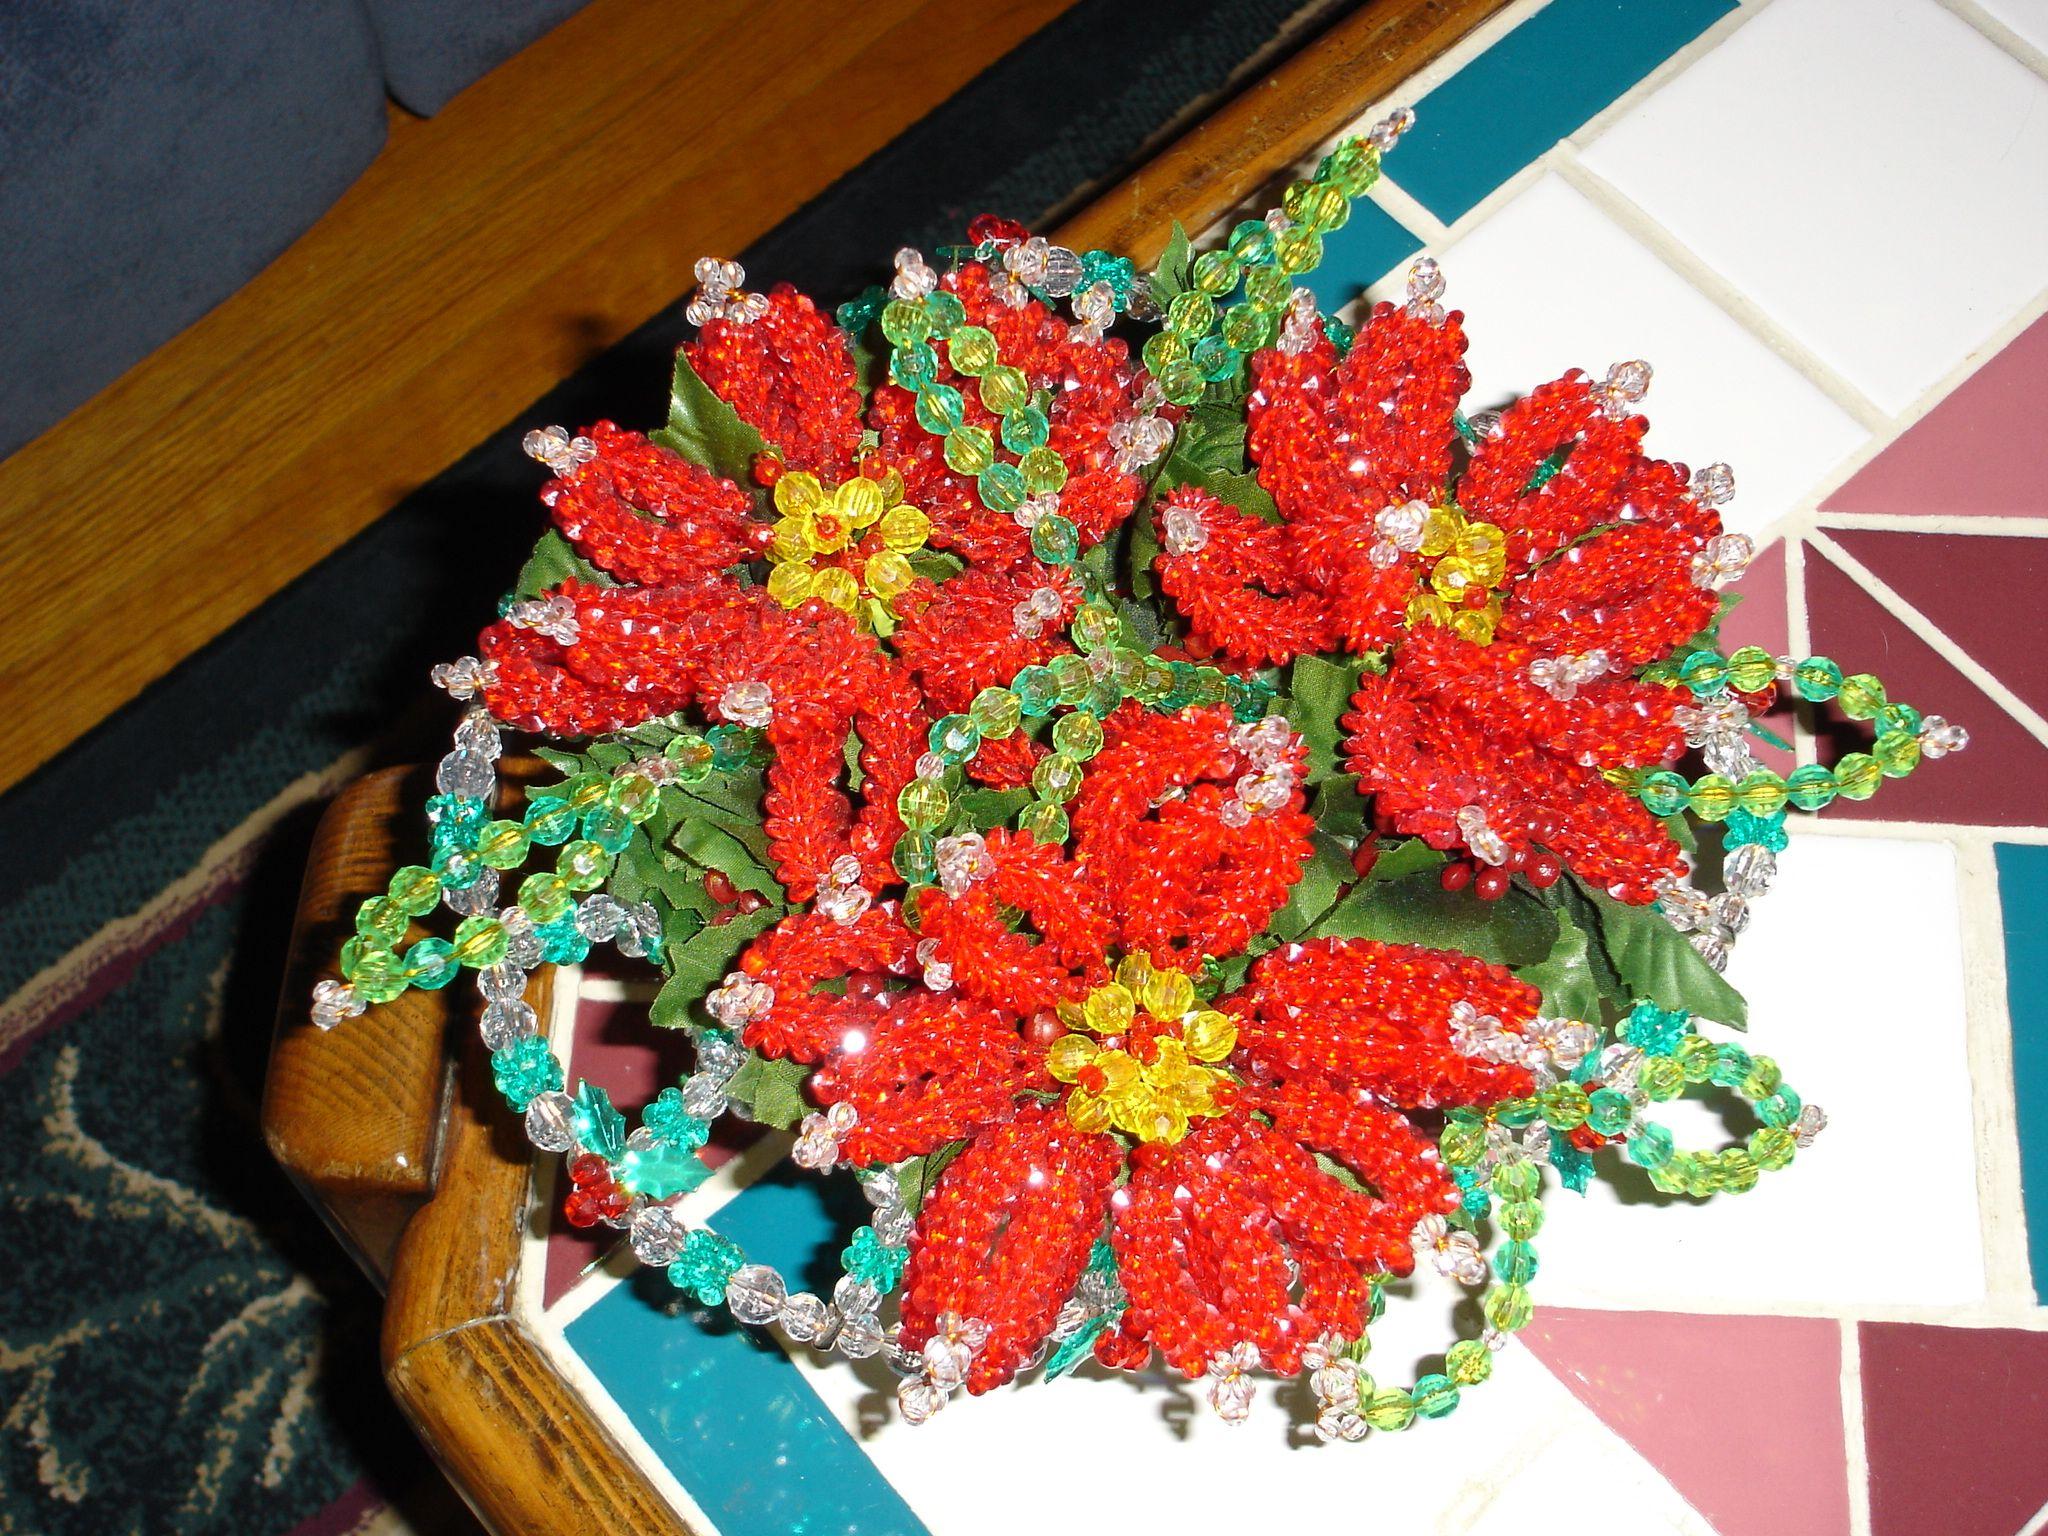 Beaded poinsettias in a beaded Christmas basket